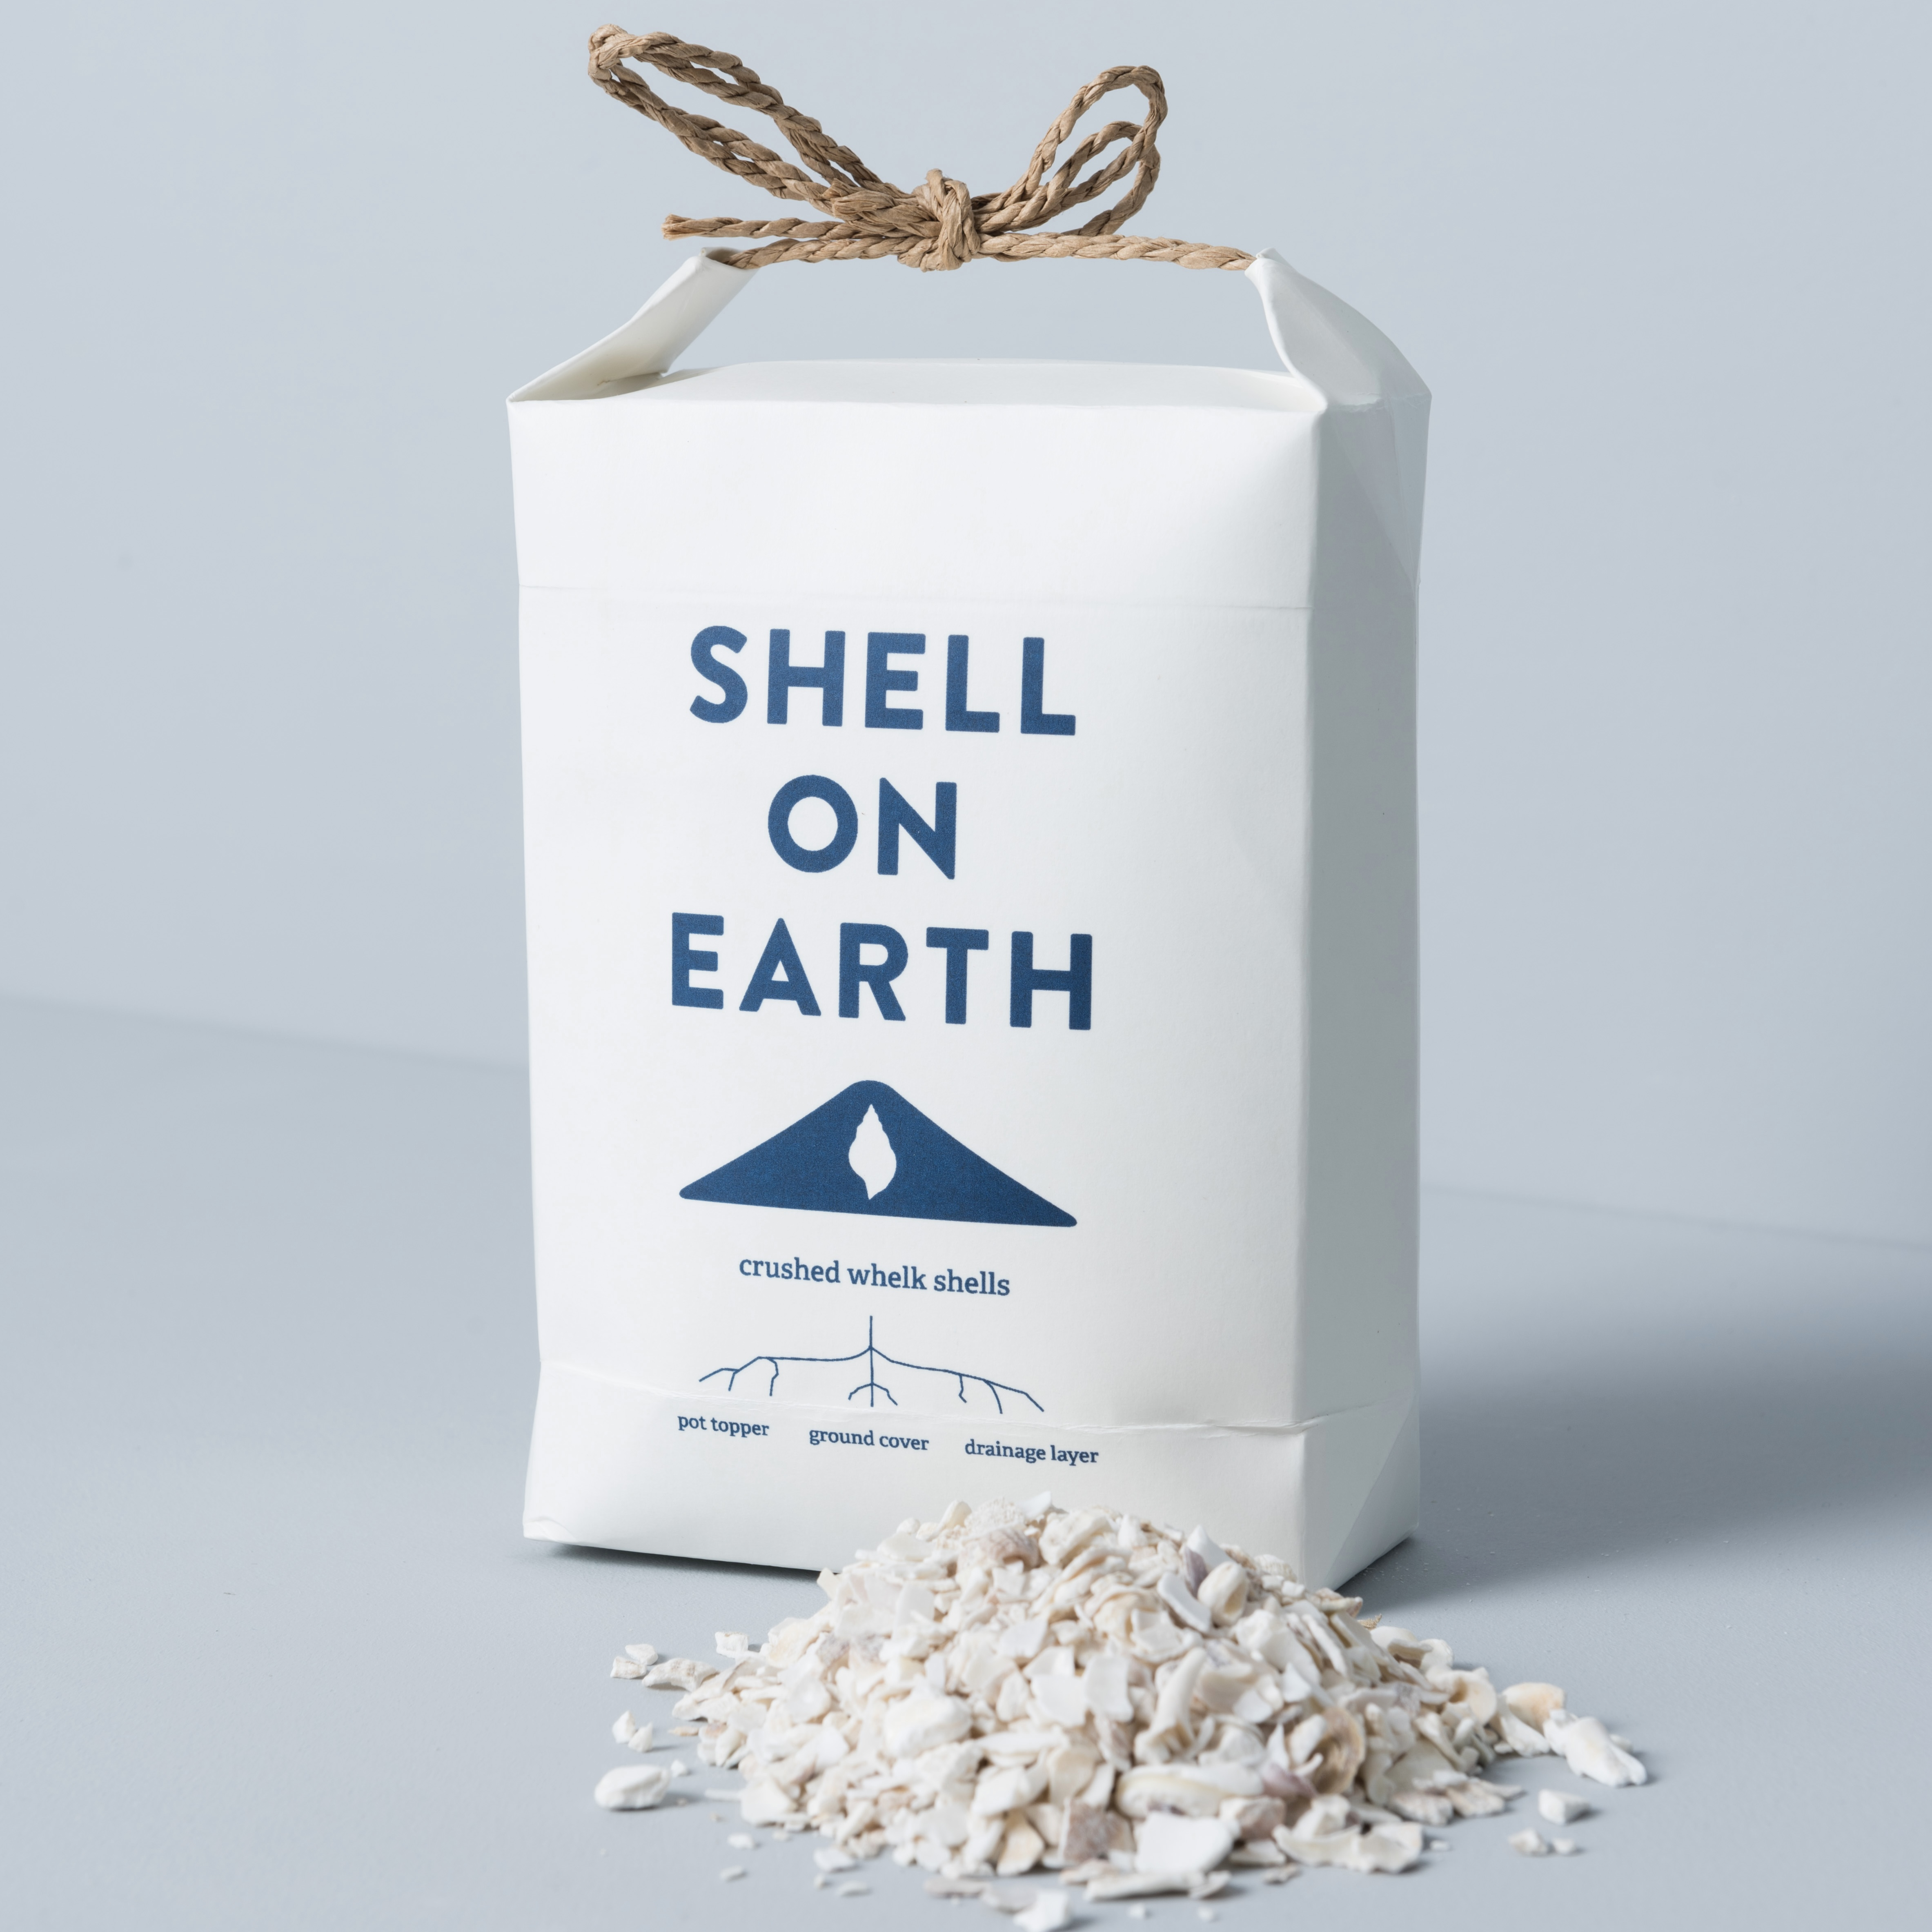 Shell On Earth crushed whelk shells